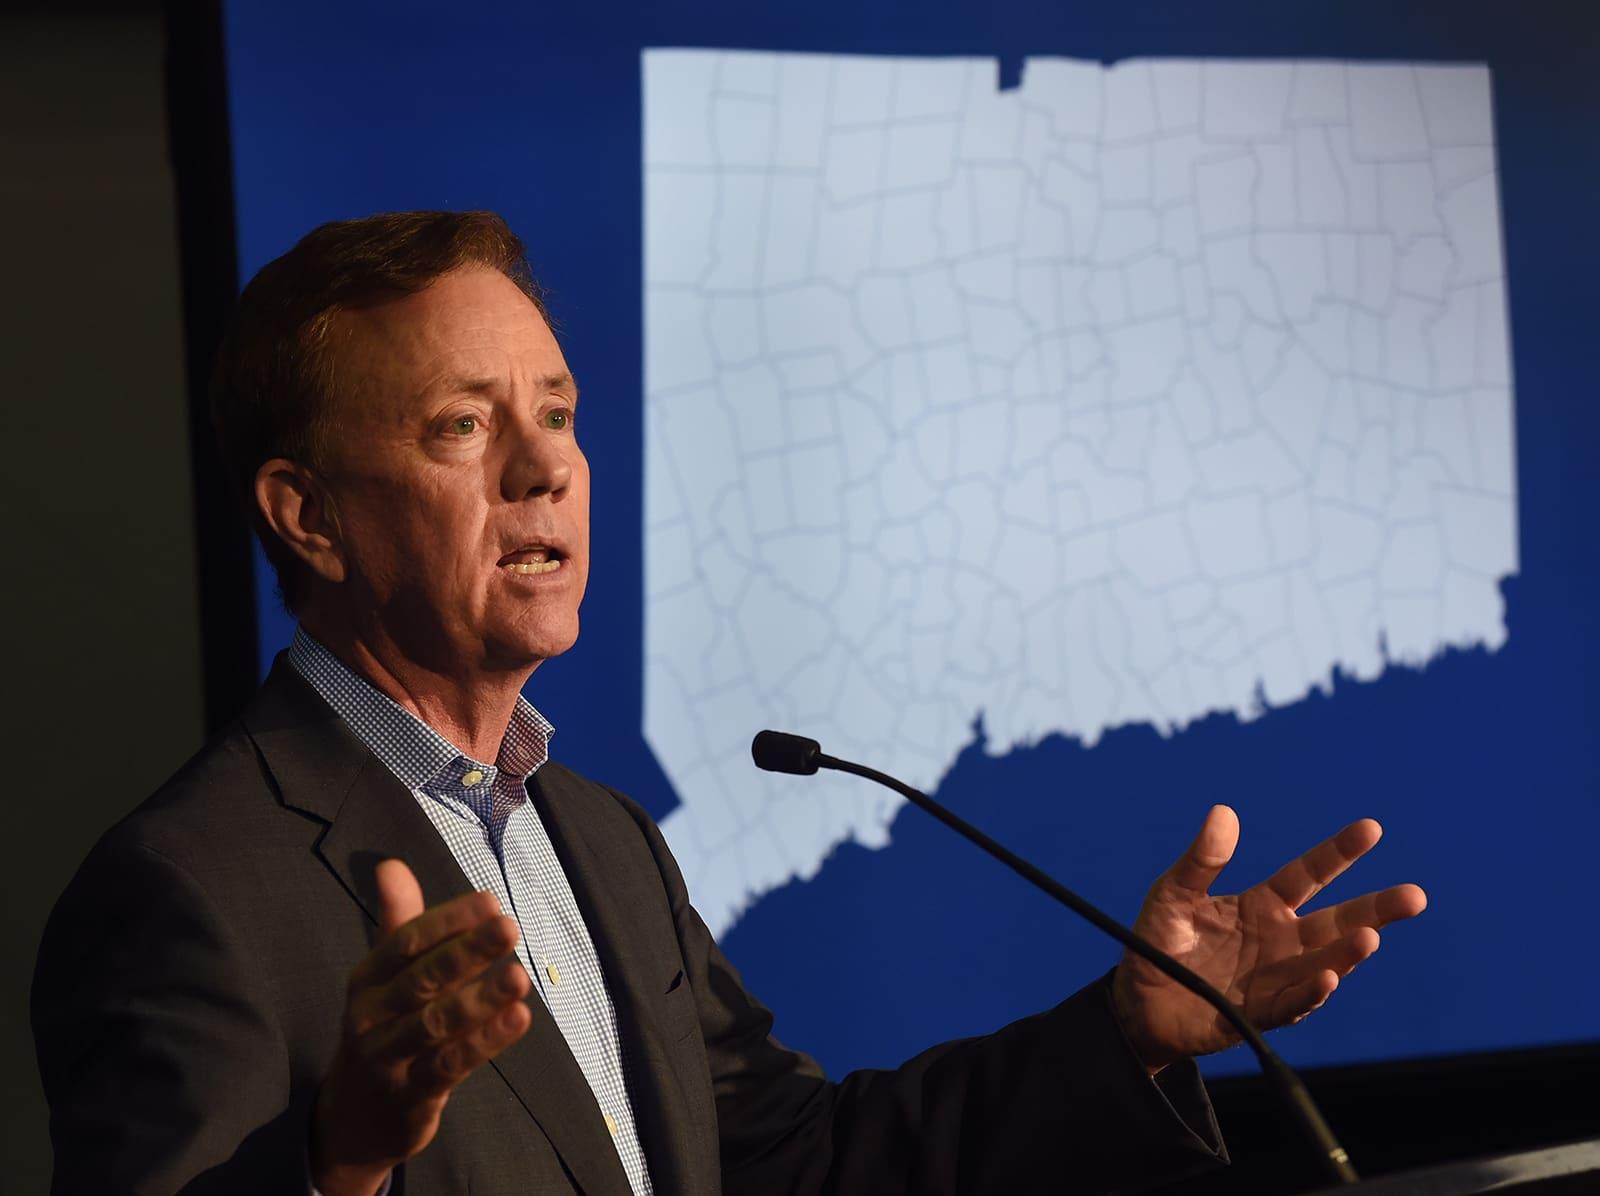 Georgia got lifting coronavirus restrictions backward, Connecticut Gov. Ned Lamont says